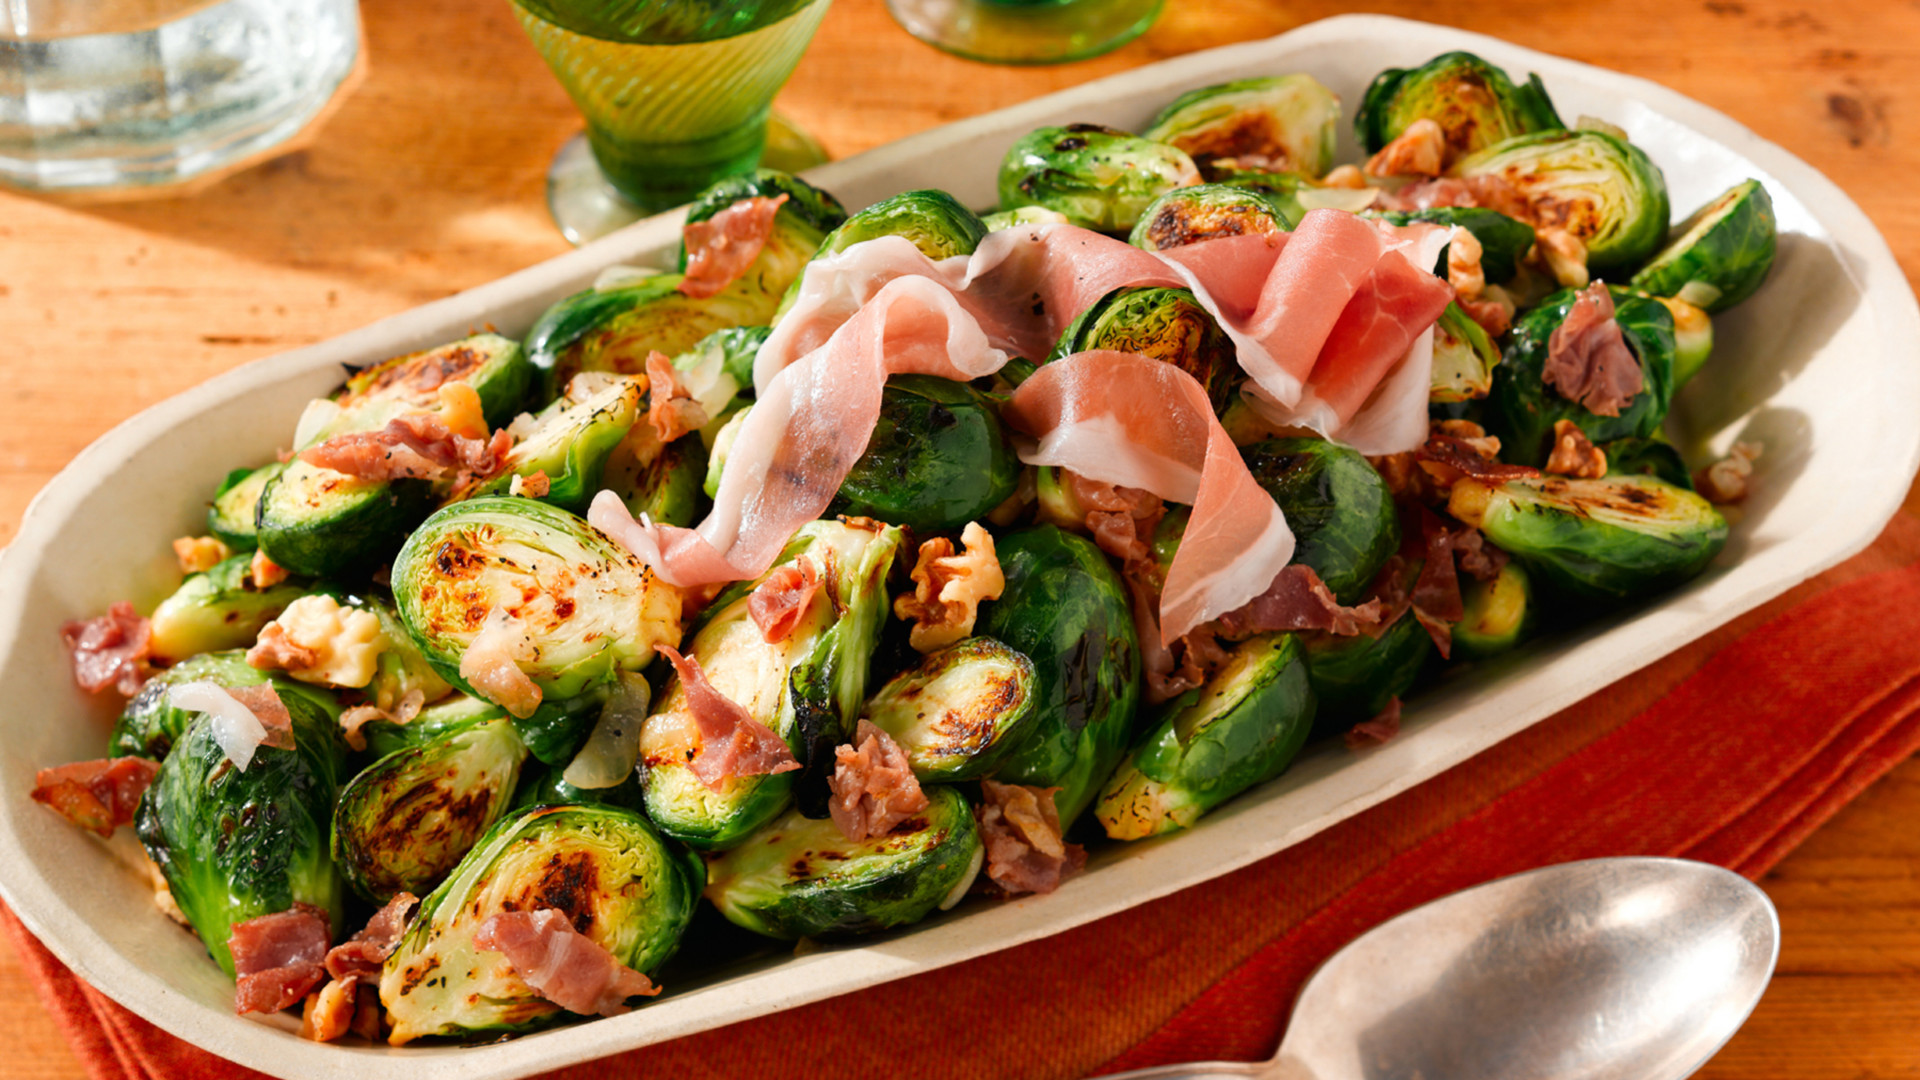 Italian appetizers: Sautéed Brussel Sprouts with Prosciutto di San Daniele